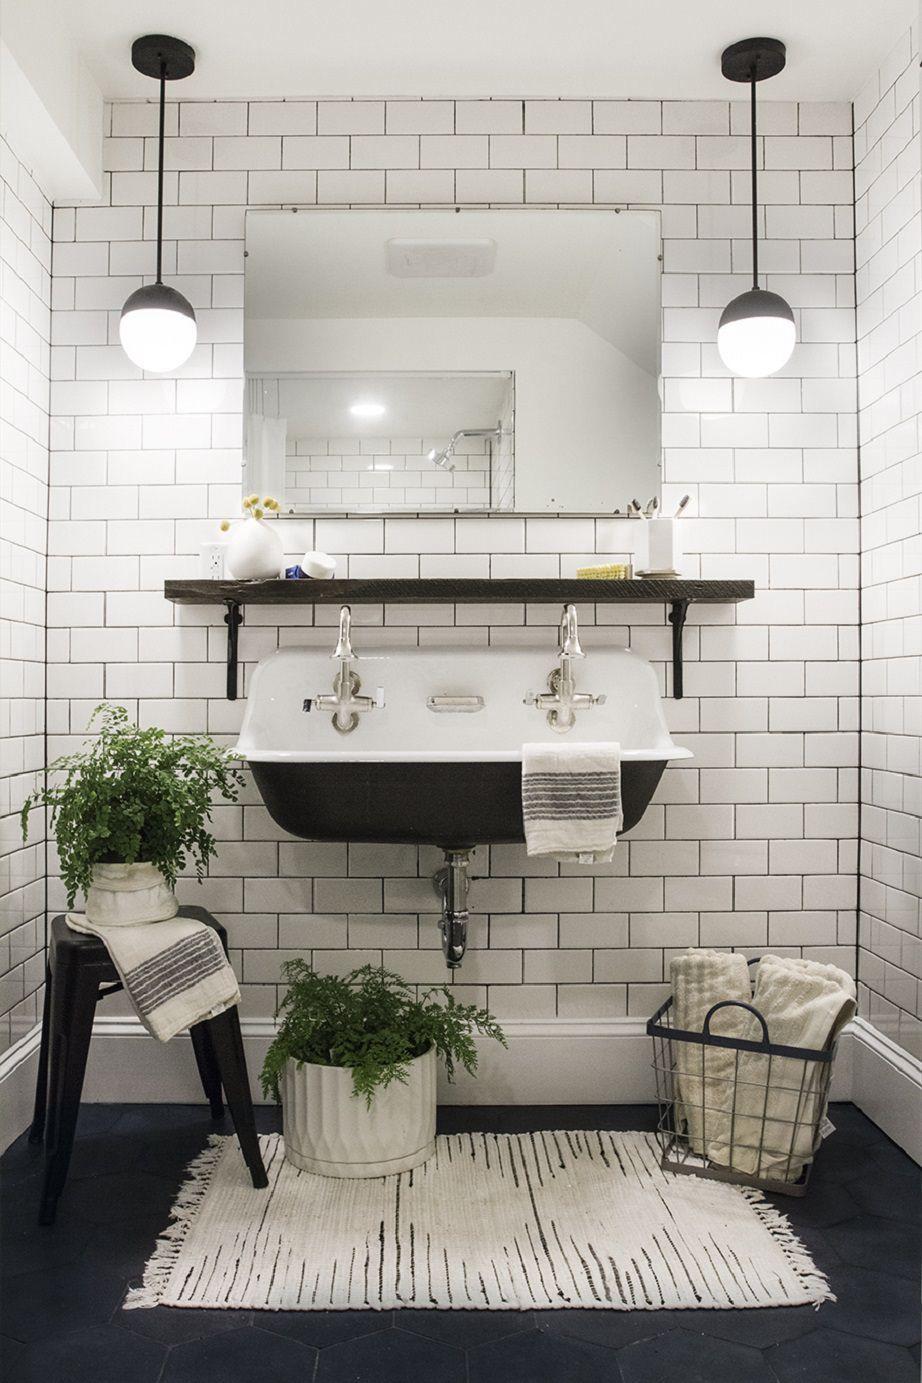 2018 Design Trends for the Bathroom | Pinterest | Design trends ...